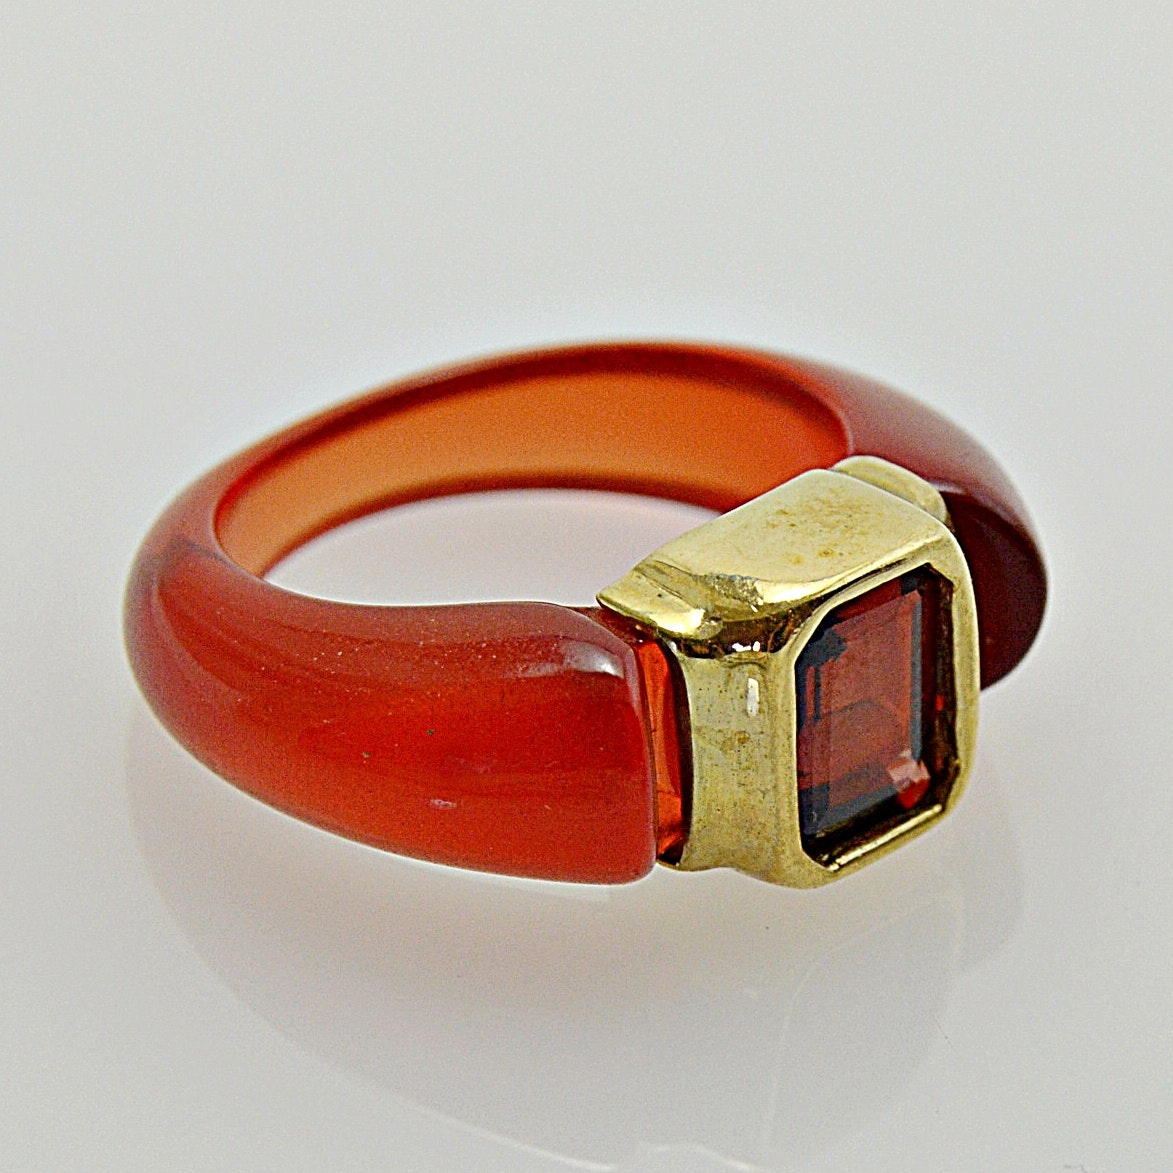 Modern 10K Yellow Gold, Garnet and Resin Ring